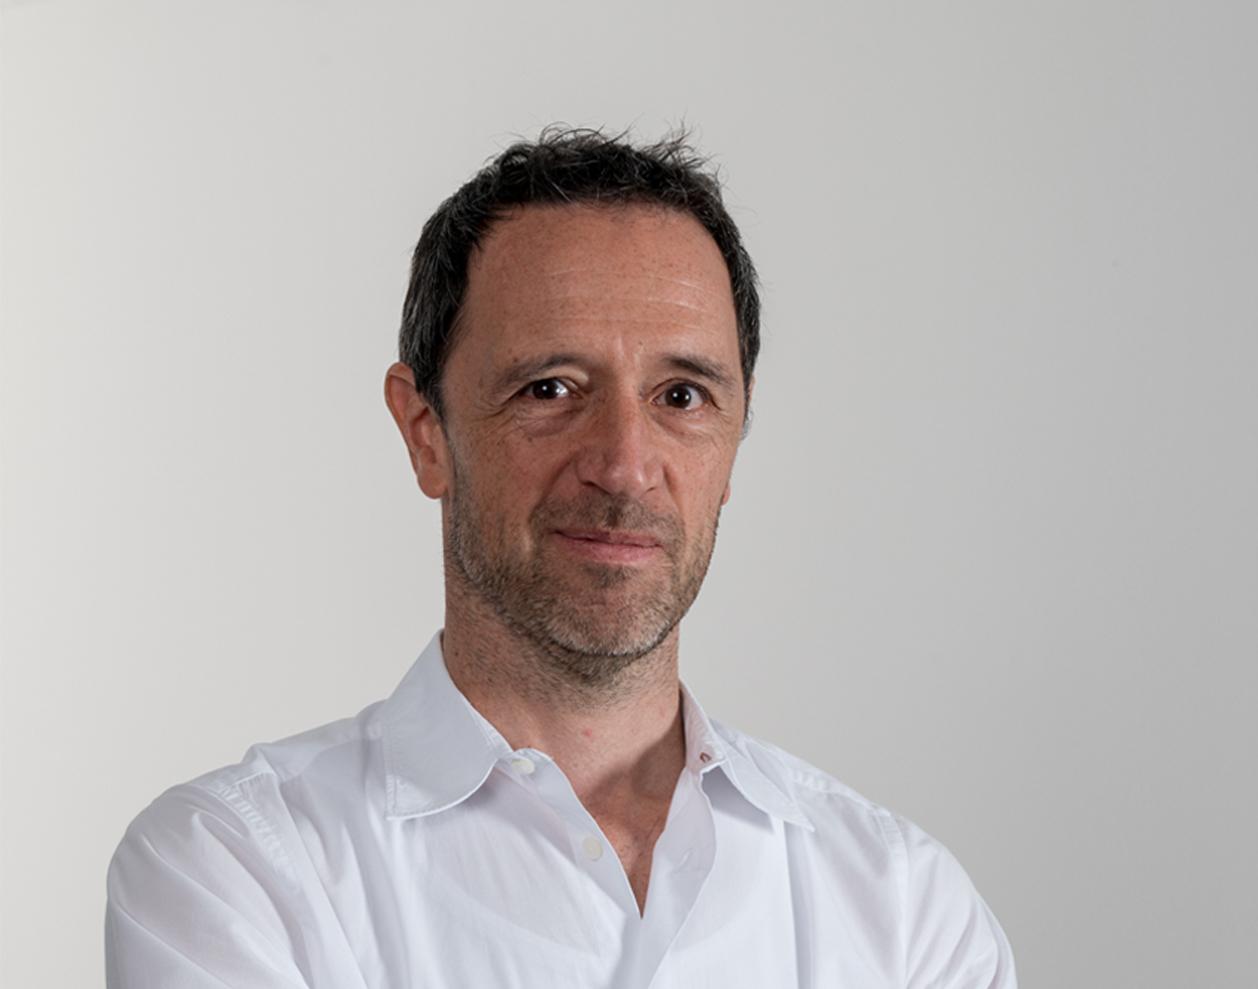 Florian Holzherr